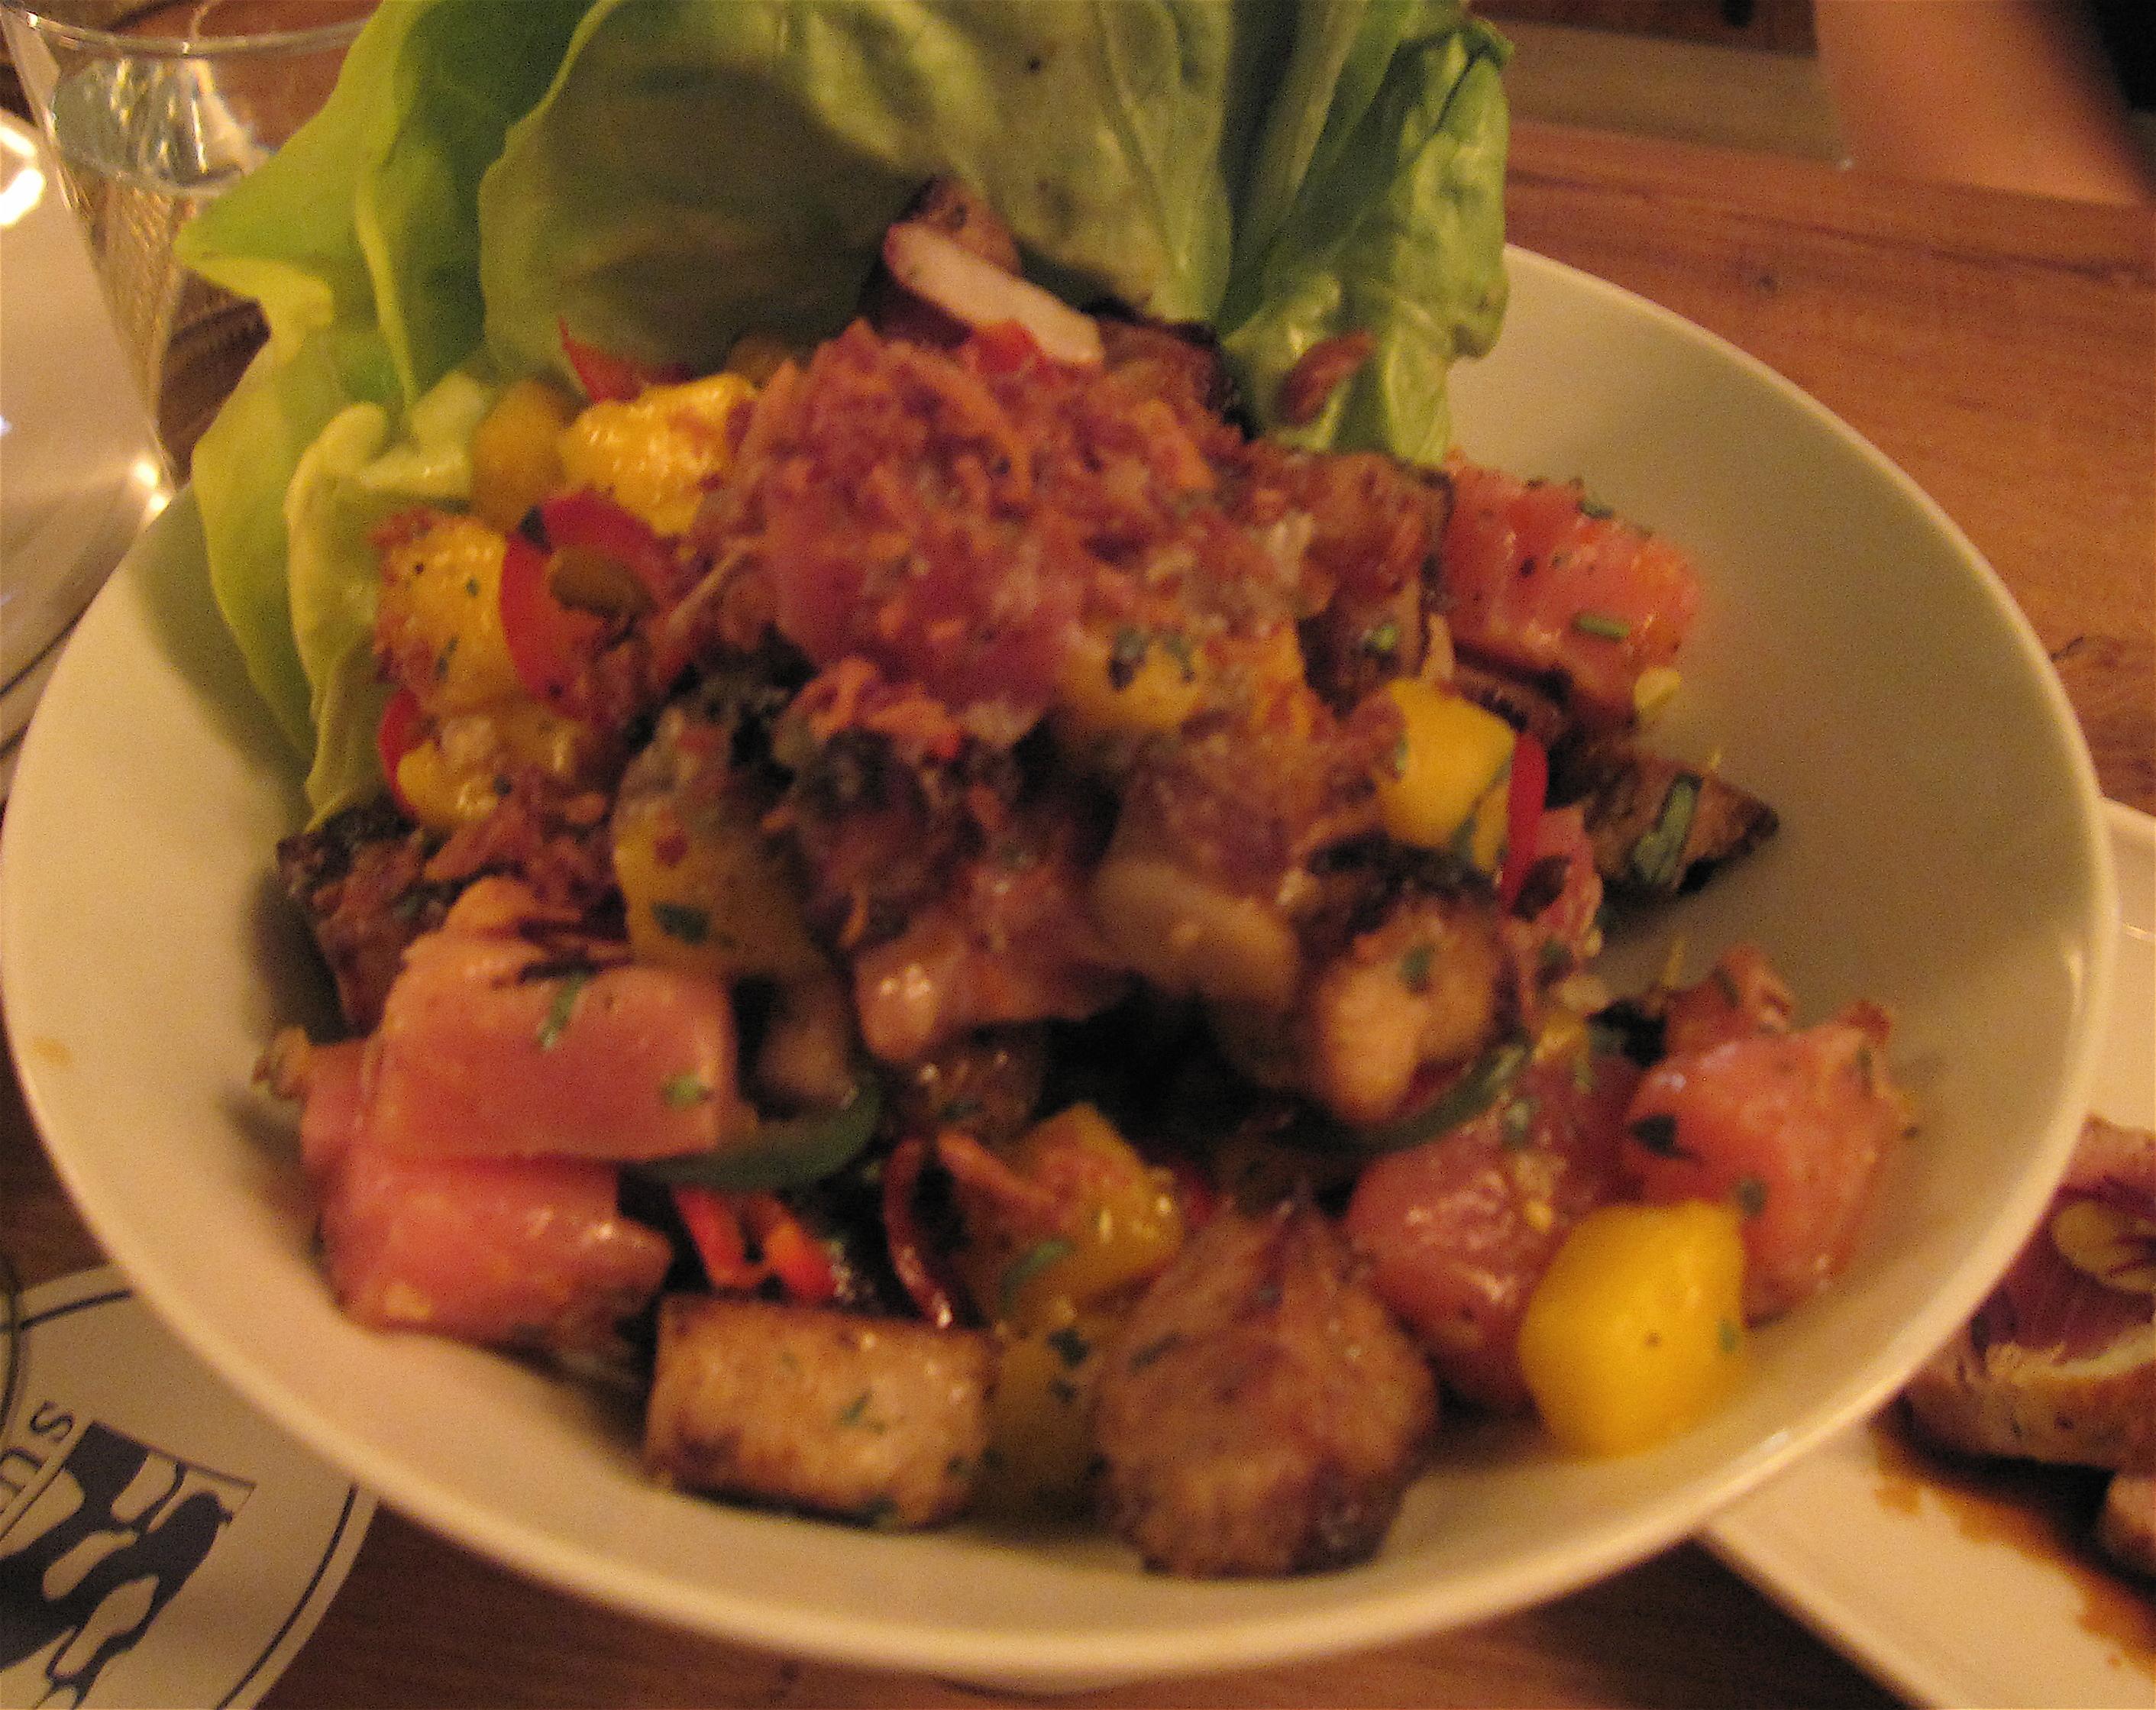 Grilled ahi tuna and pork salad